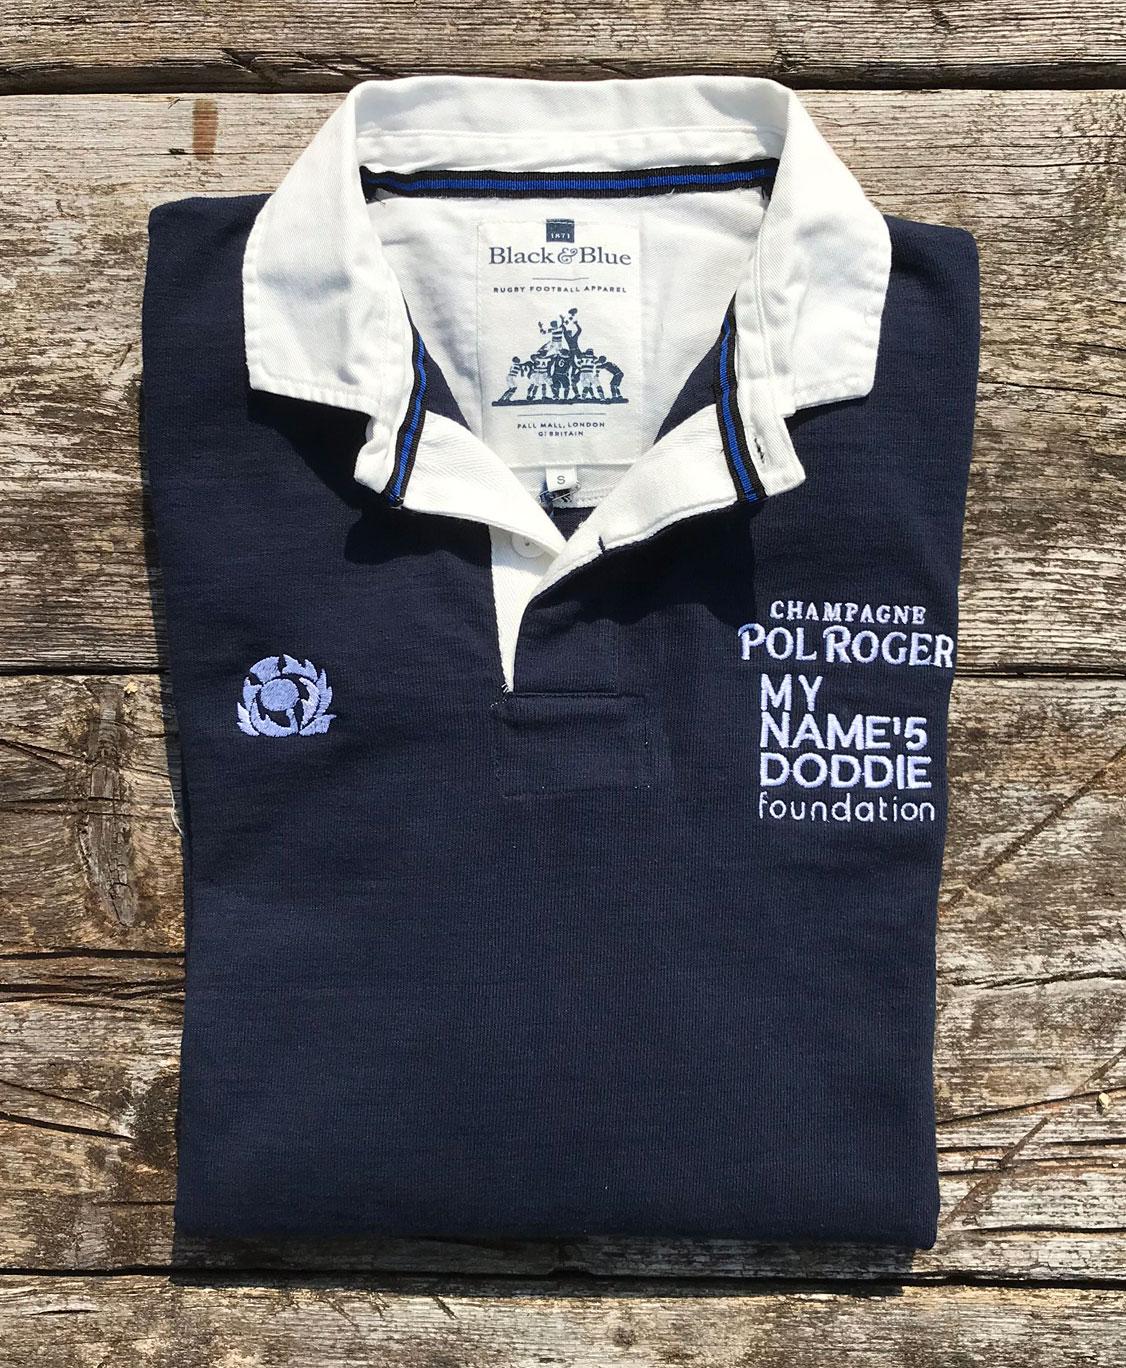 Pol Roger Champagne - Doddie Weir Rugby Shiirt